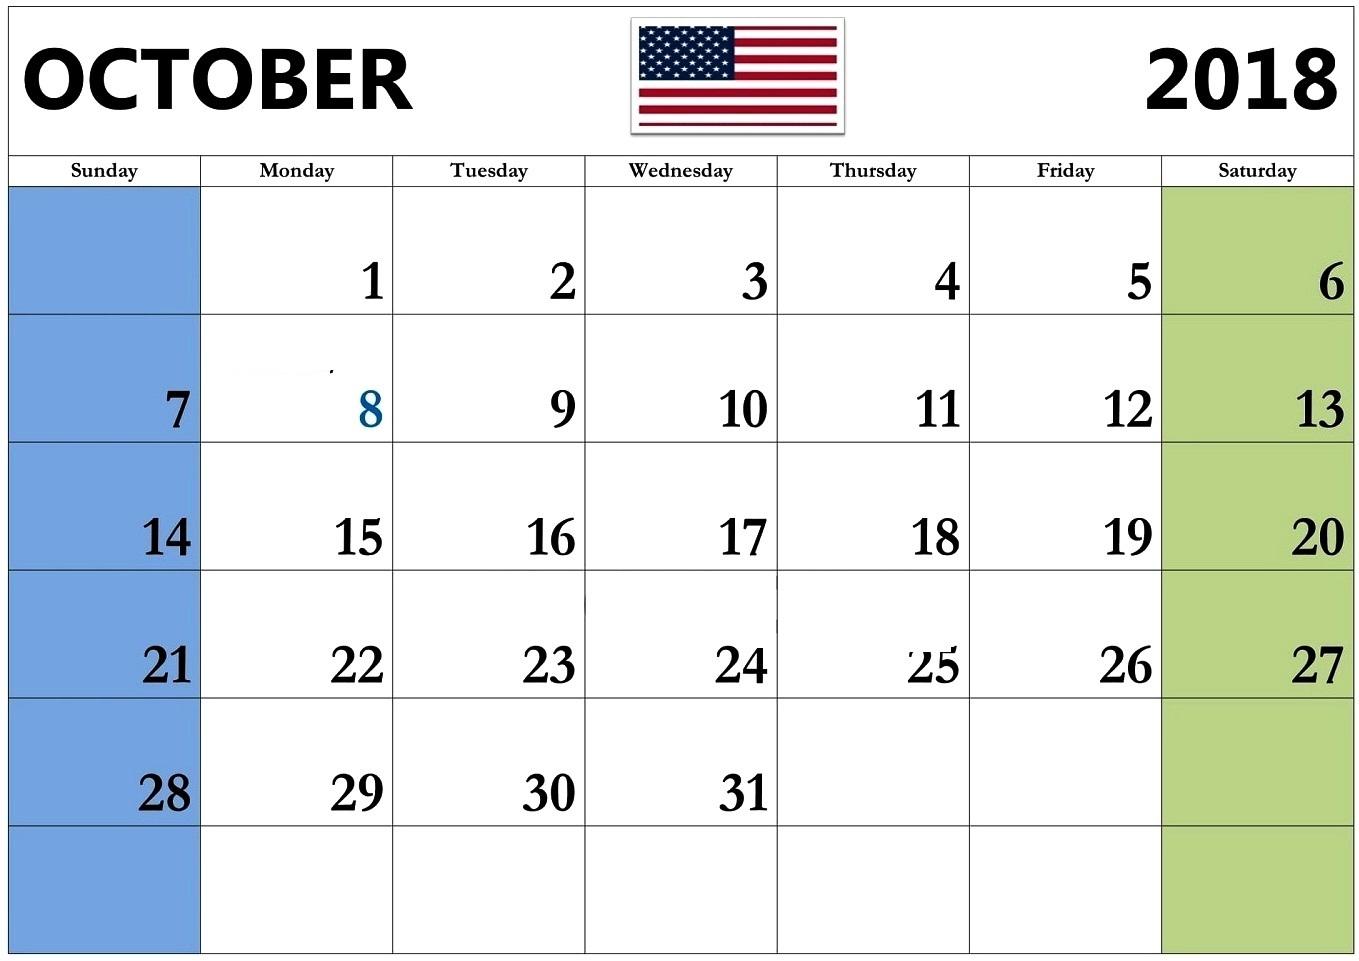 October 2018 Calendar United States